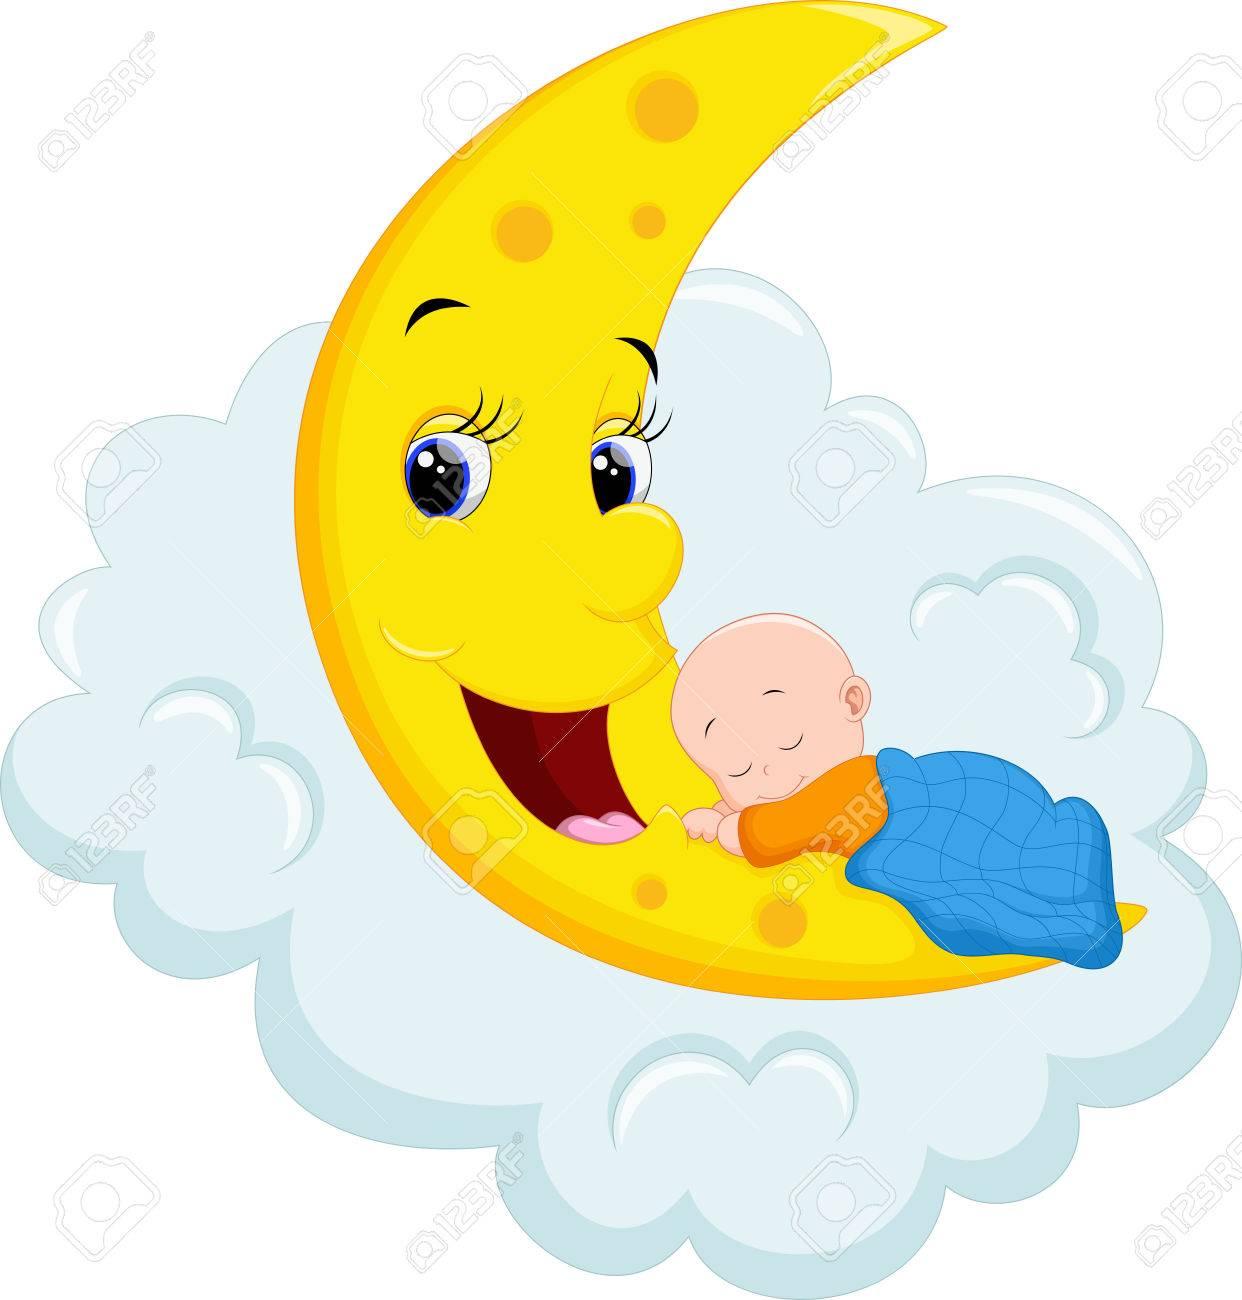 Baby Sleeping on Moon.